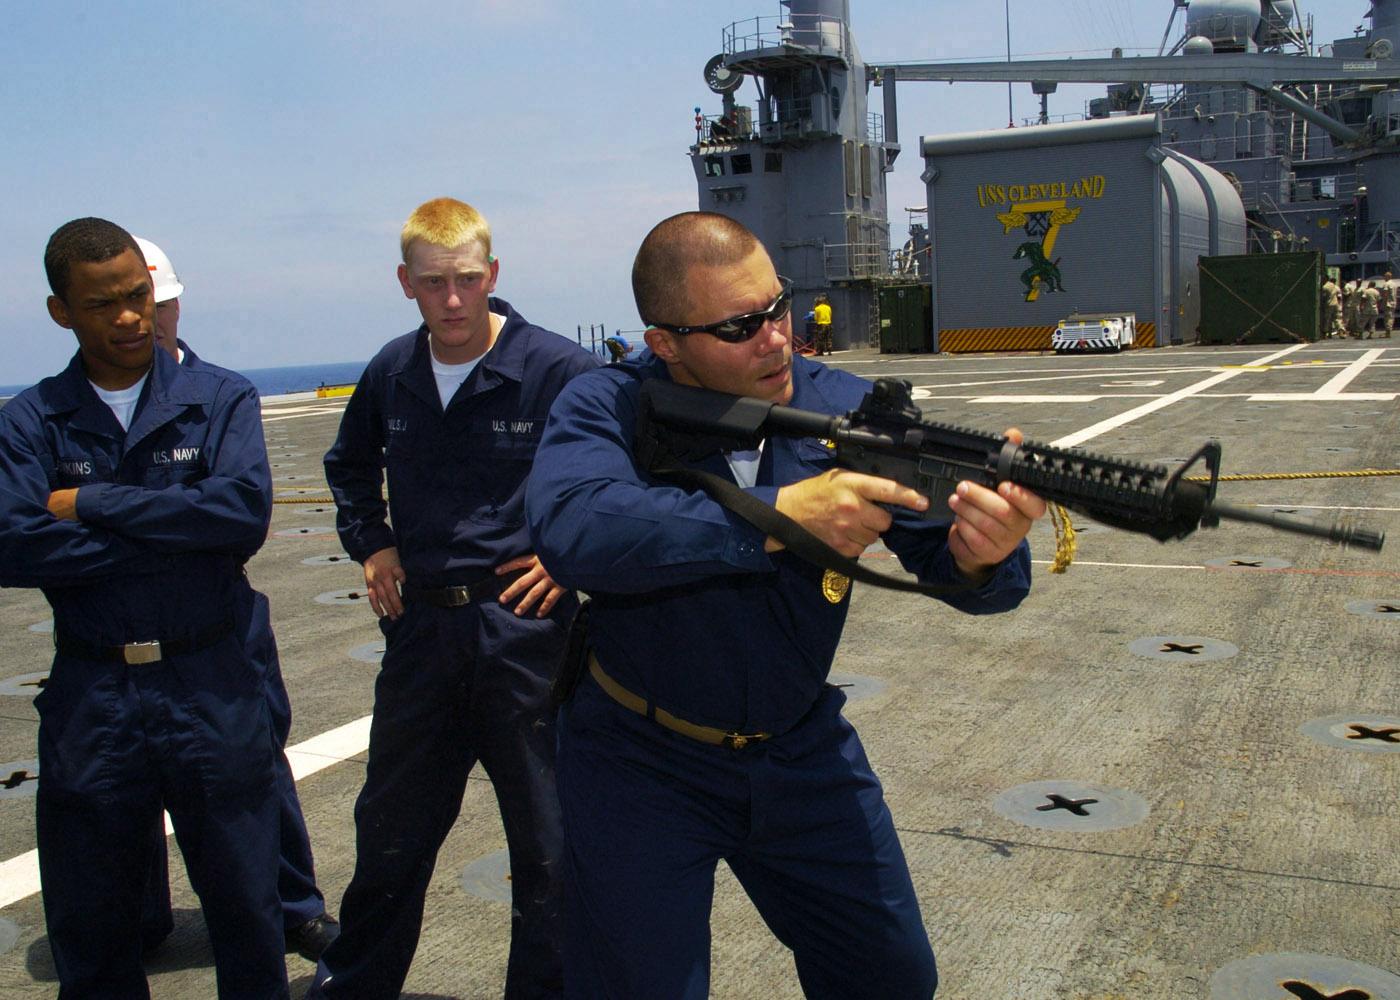 File:US Navy 090723-N-3925A-001 Chief Master-At-Arms James ...